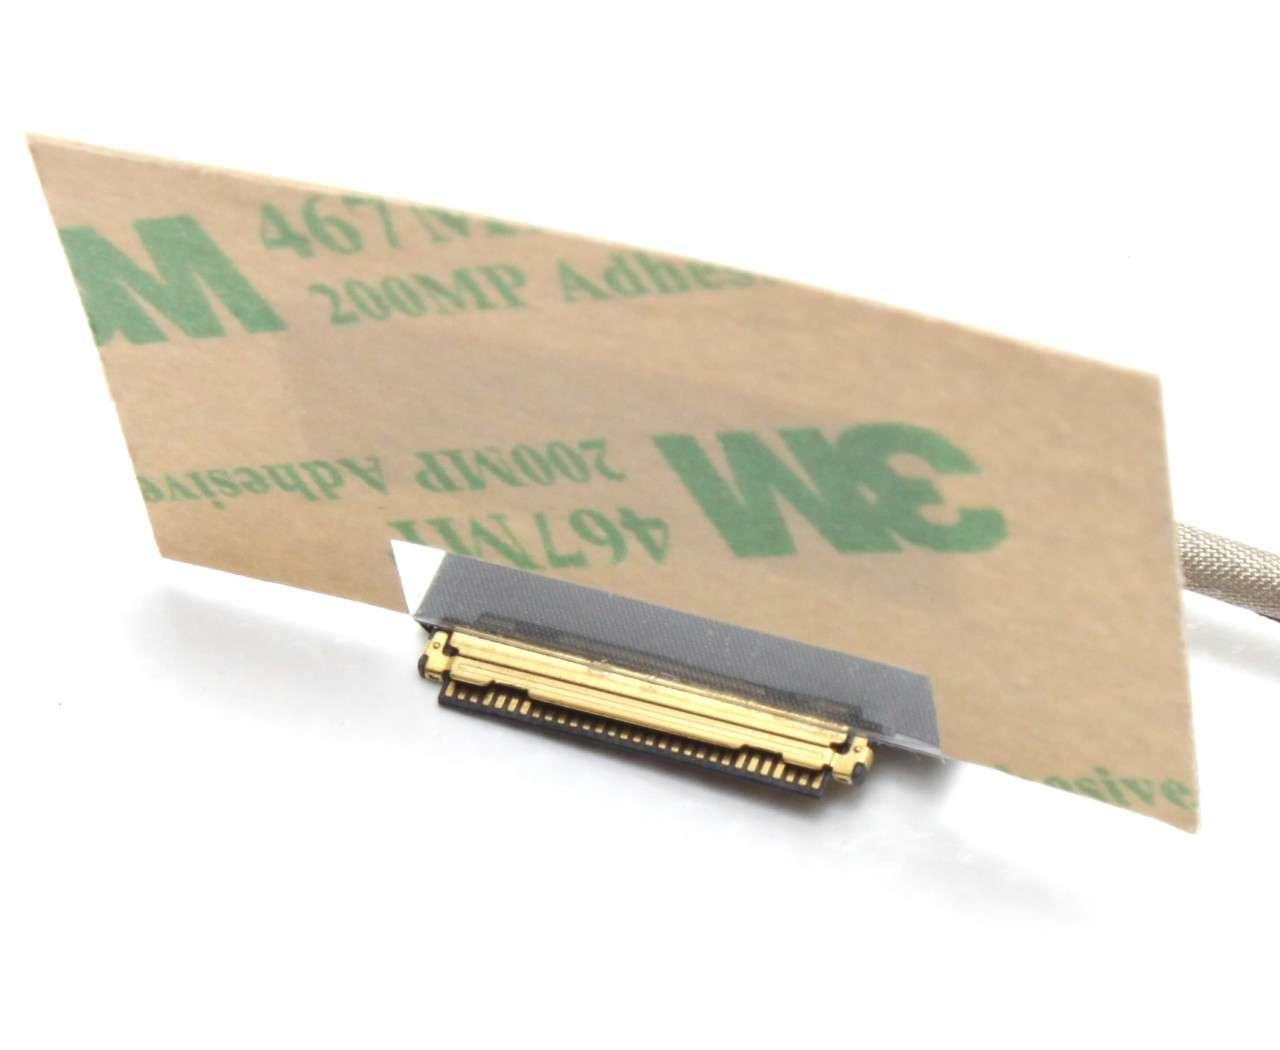 Cablu video Edp Lenovo IdeaPad DC02002R300 imagine powerlaptop.ro 2021